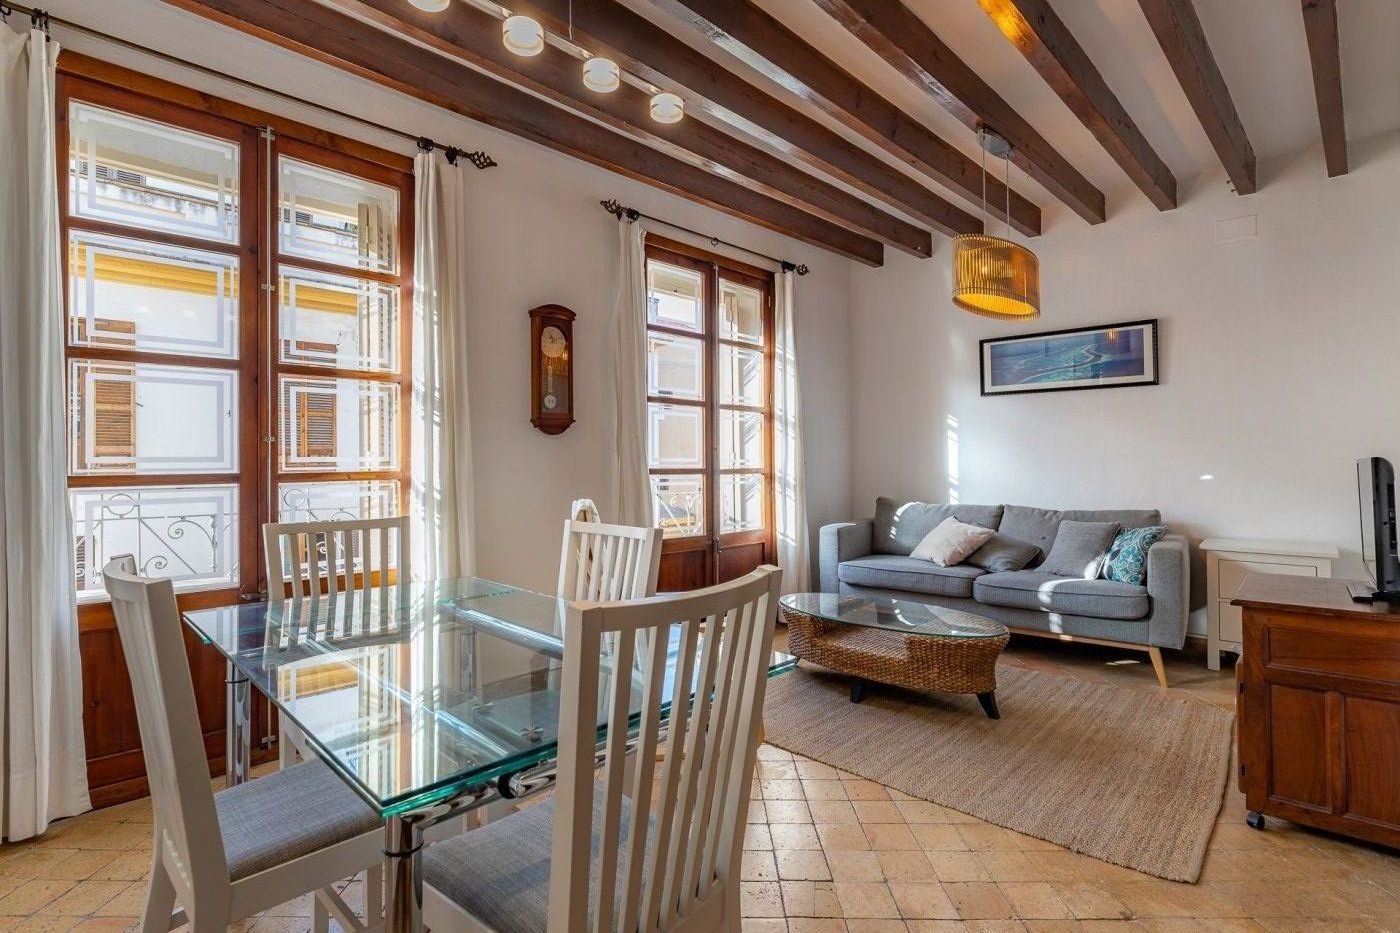 Espectacular apartamento en centro de palma - imagenInmueble1